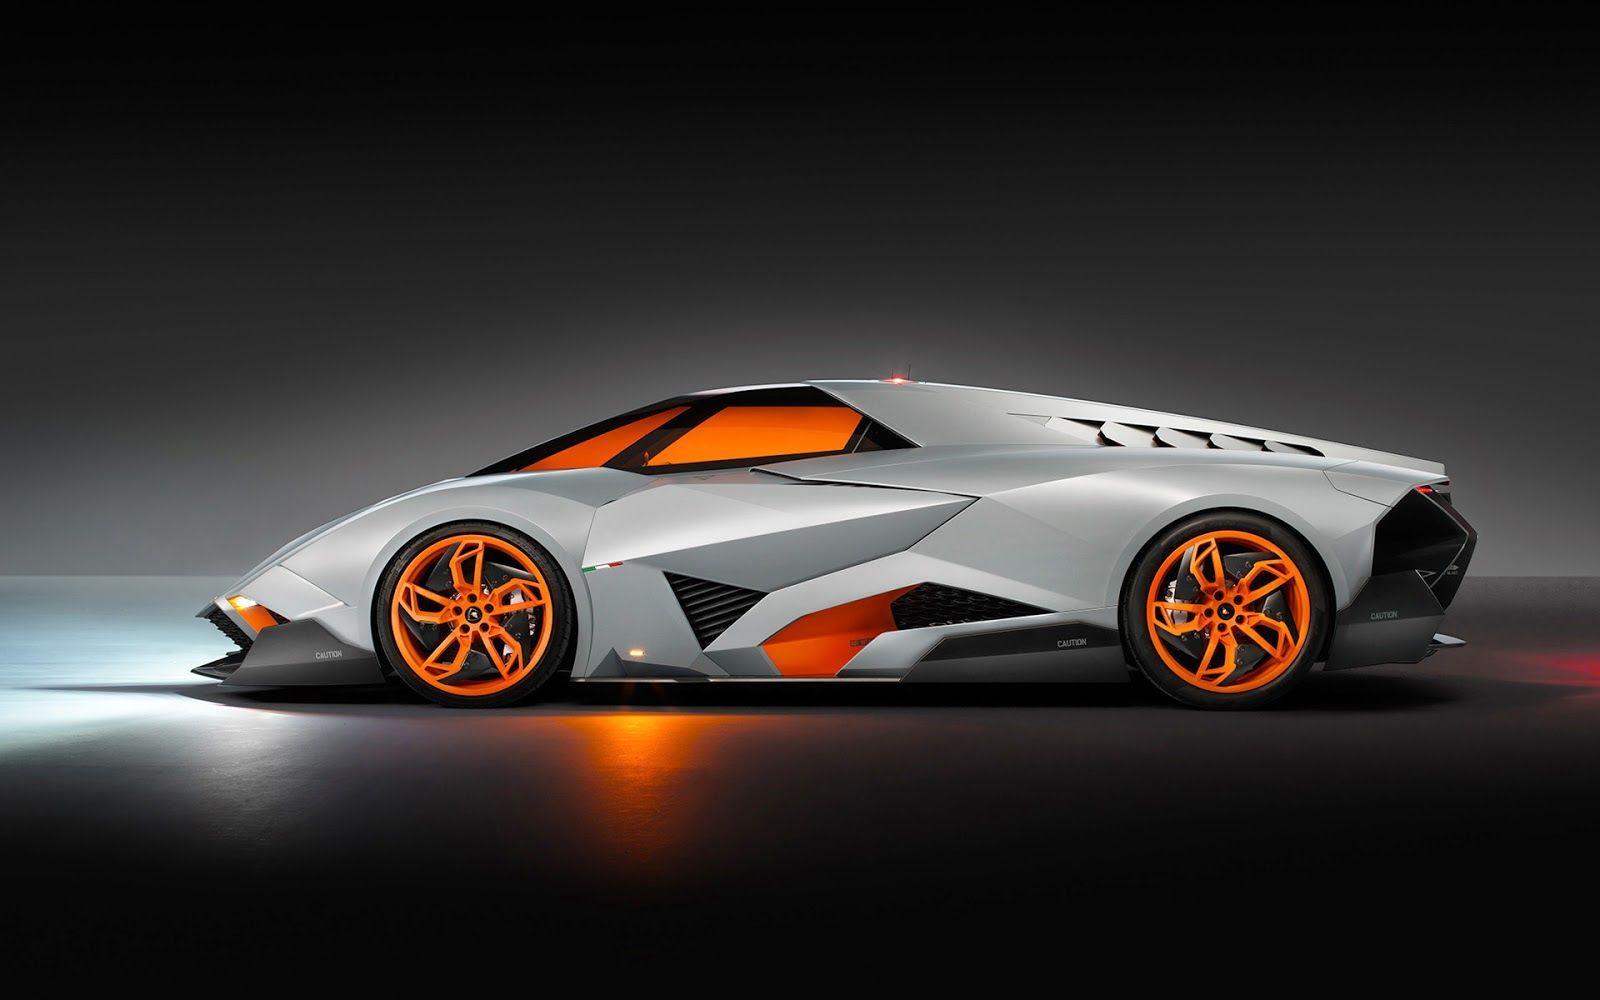 Top 1000 Cool Car Wallpapers Top Free Top 1000 Cool Car